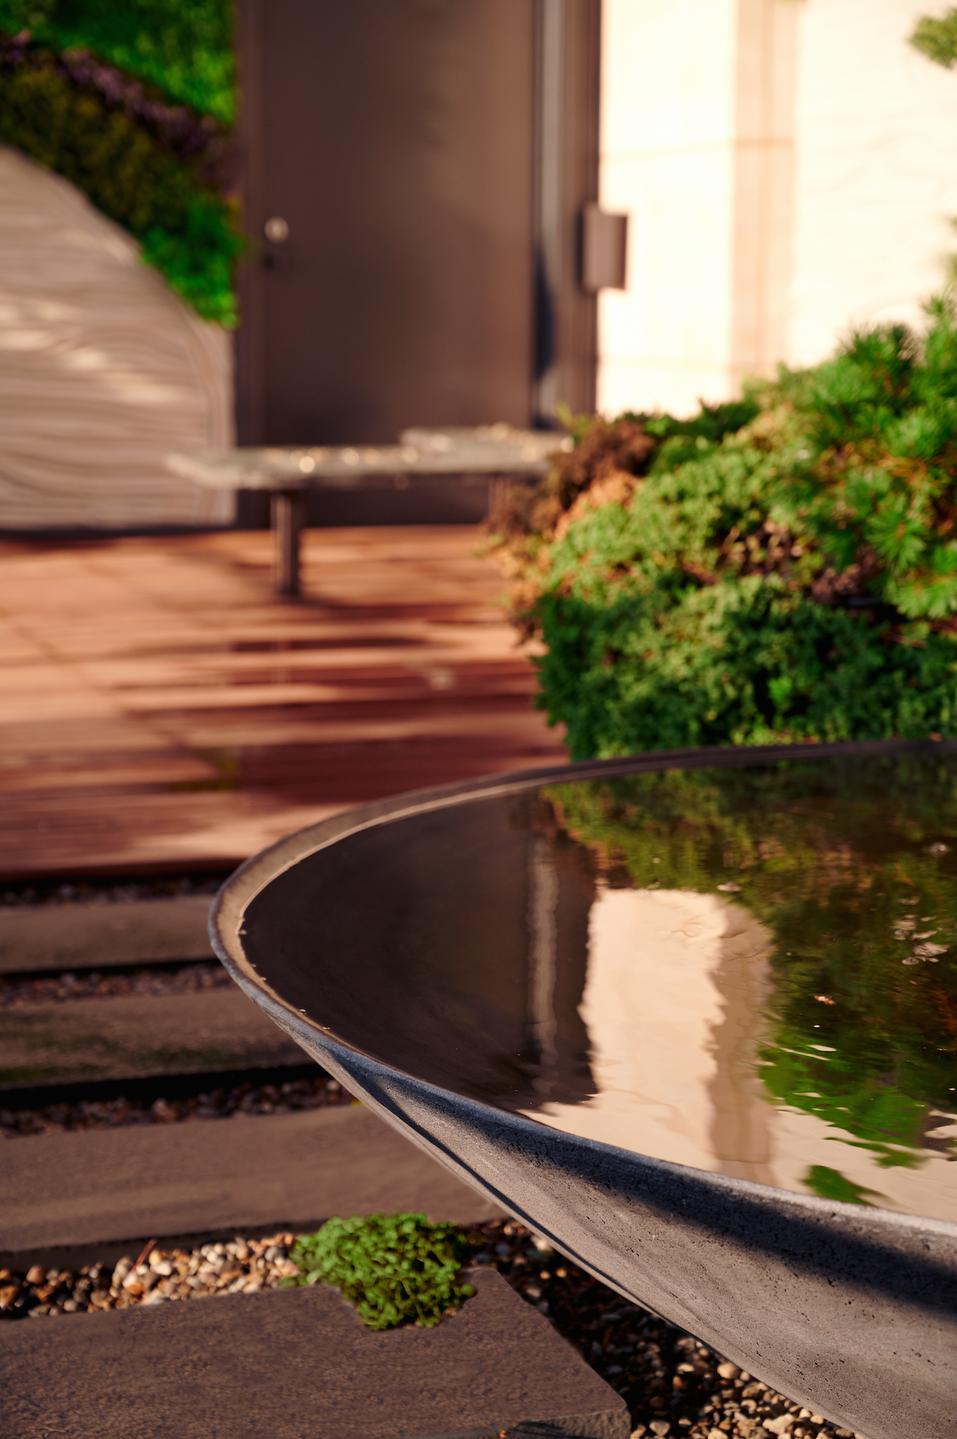 Detail of Ukiyo Fountain